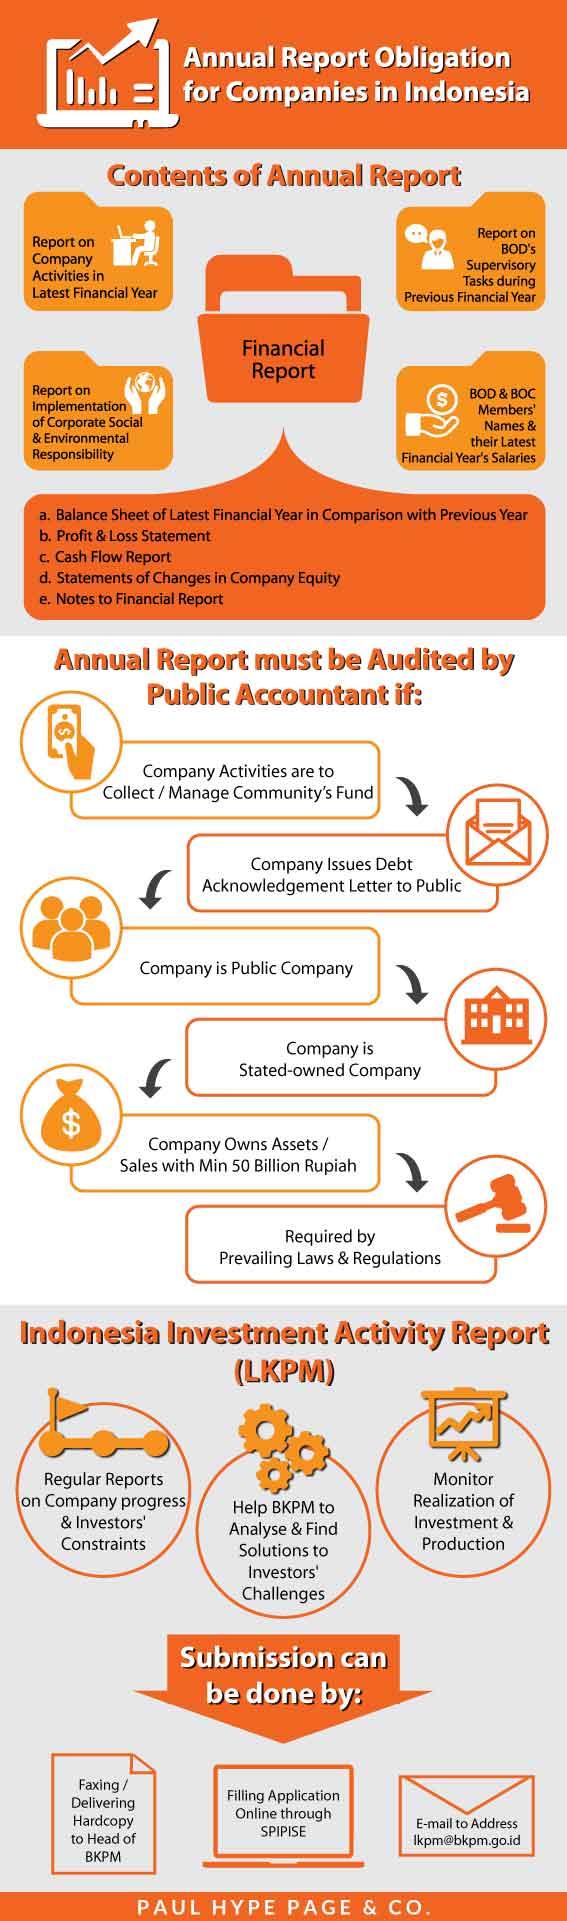 Corporate Tax Reporting Indonesia